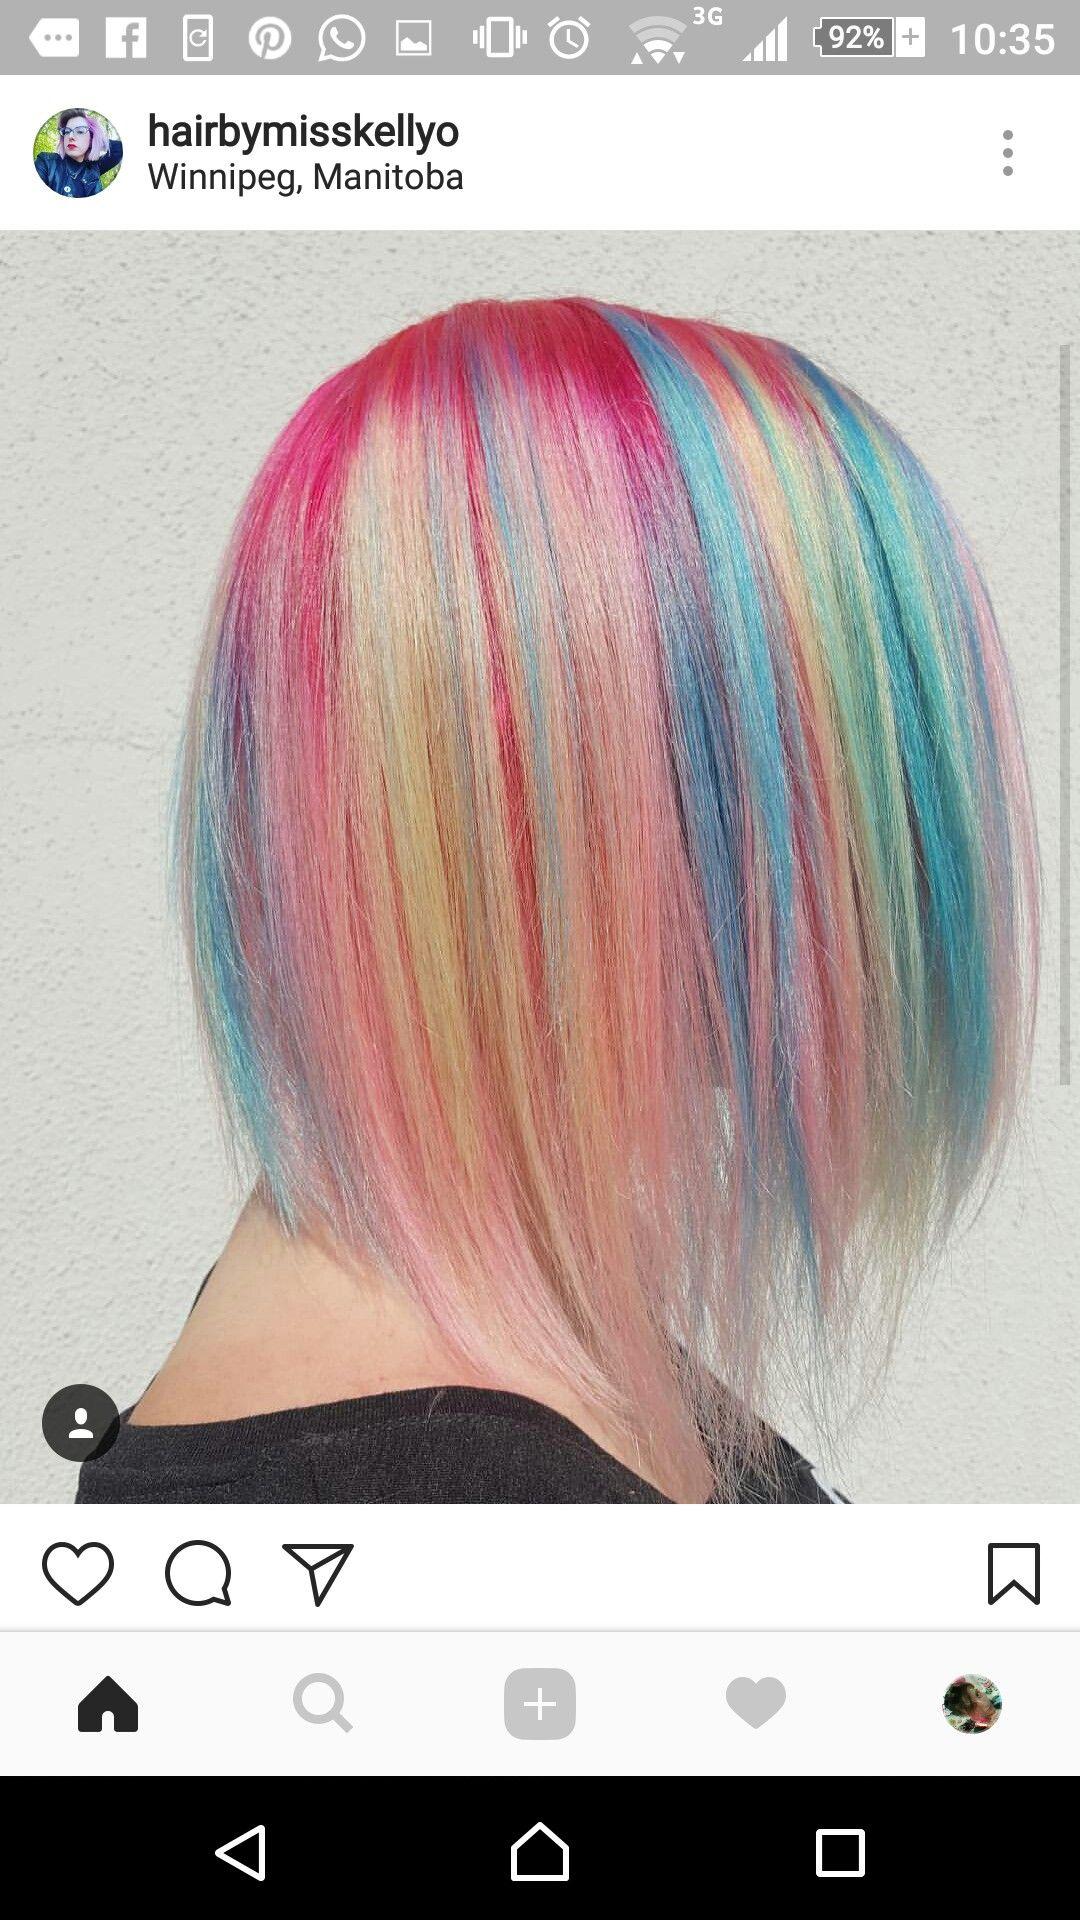 Pin by teresa savage on hairstyles pinterest hair dye hair